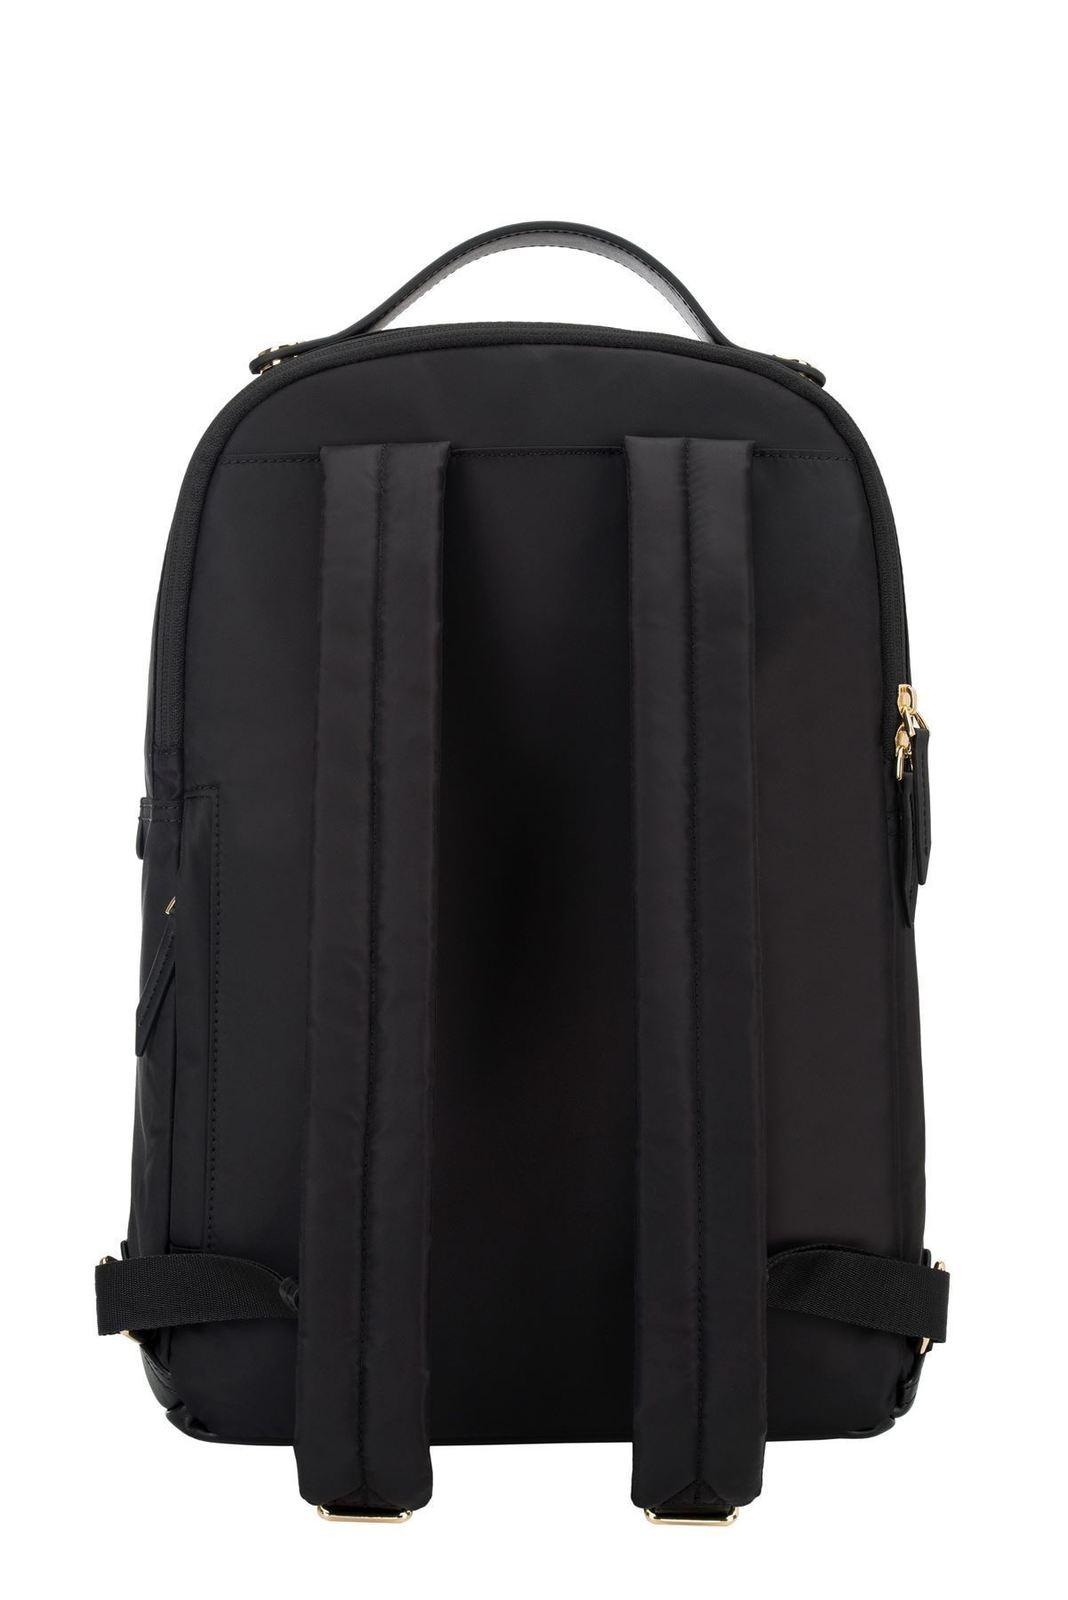 "Targus: 15"" Newport Backpack (Black) image"